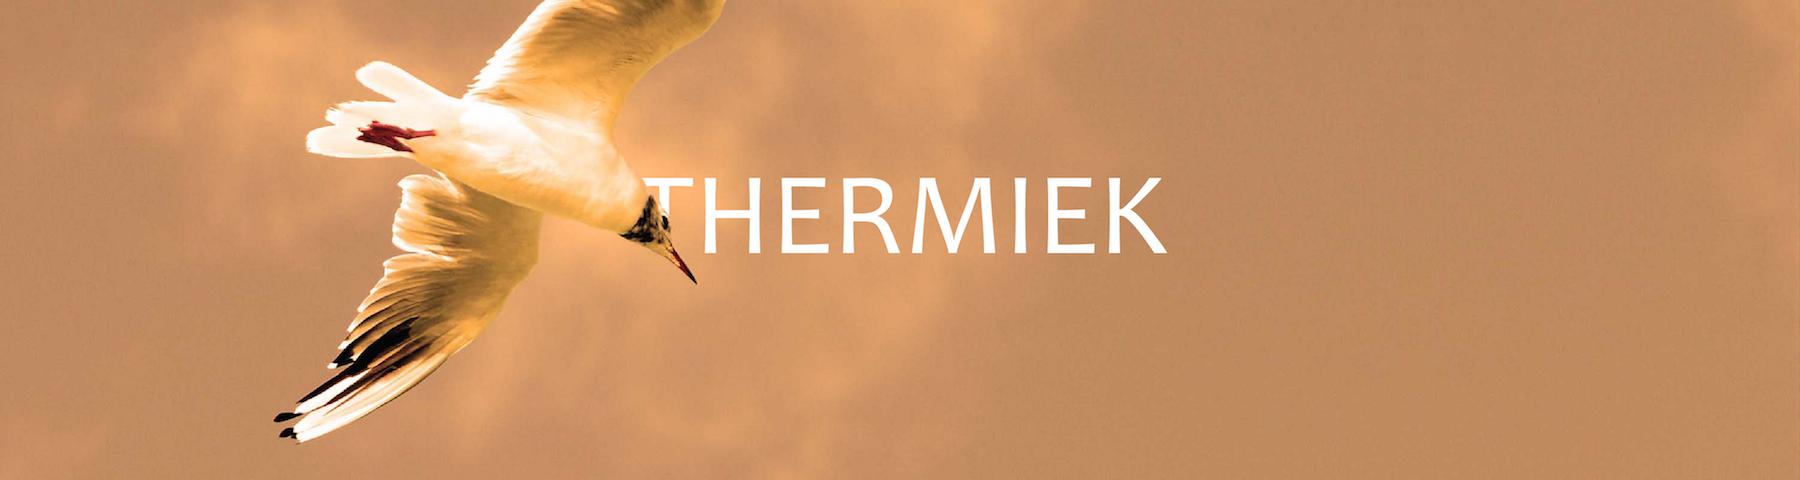 Reiki Praktijk Thermiek Amsterdam